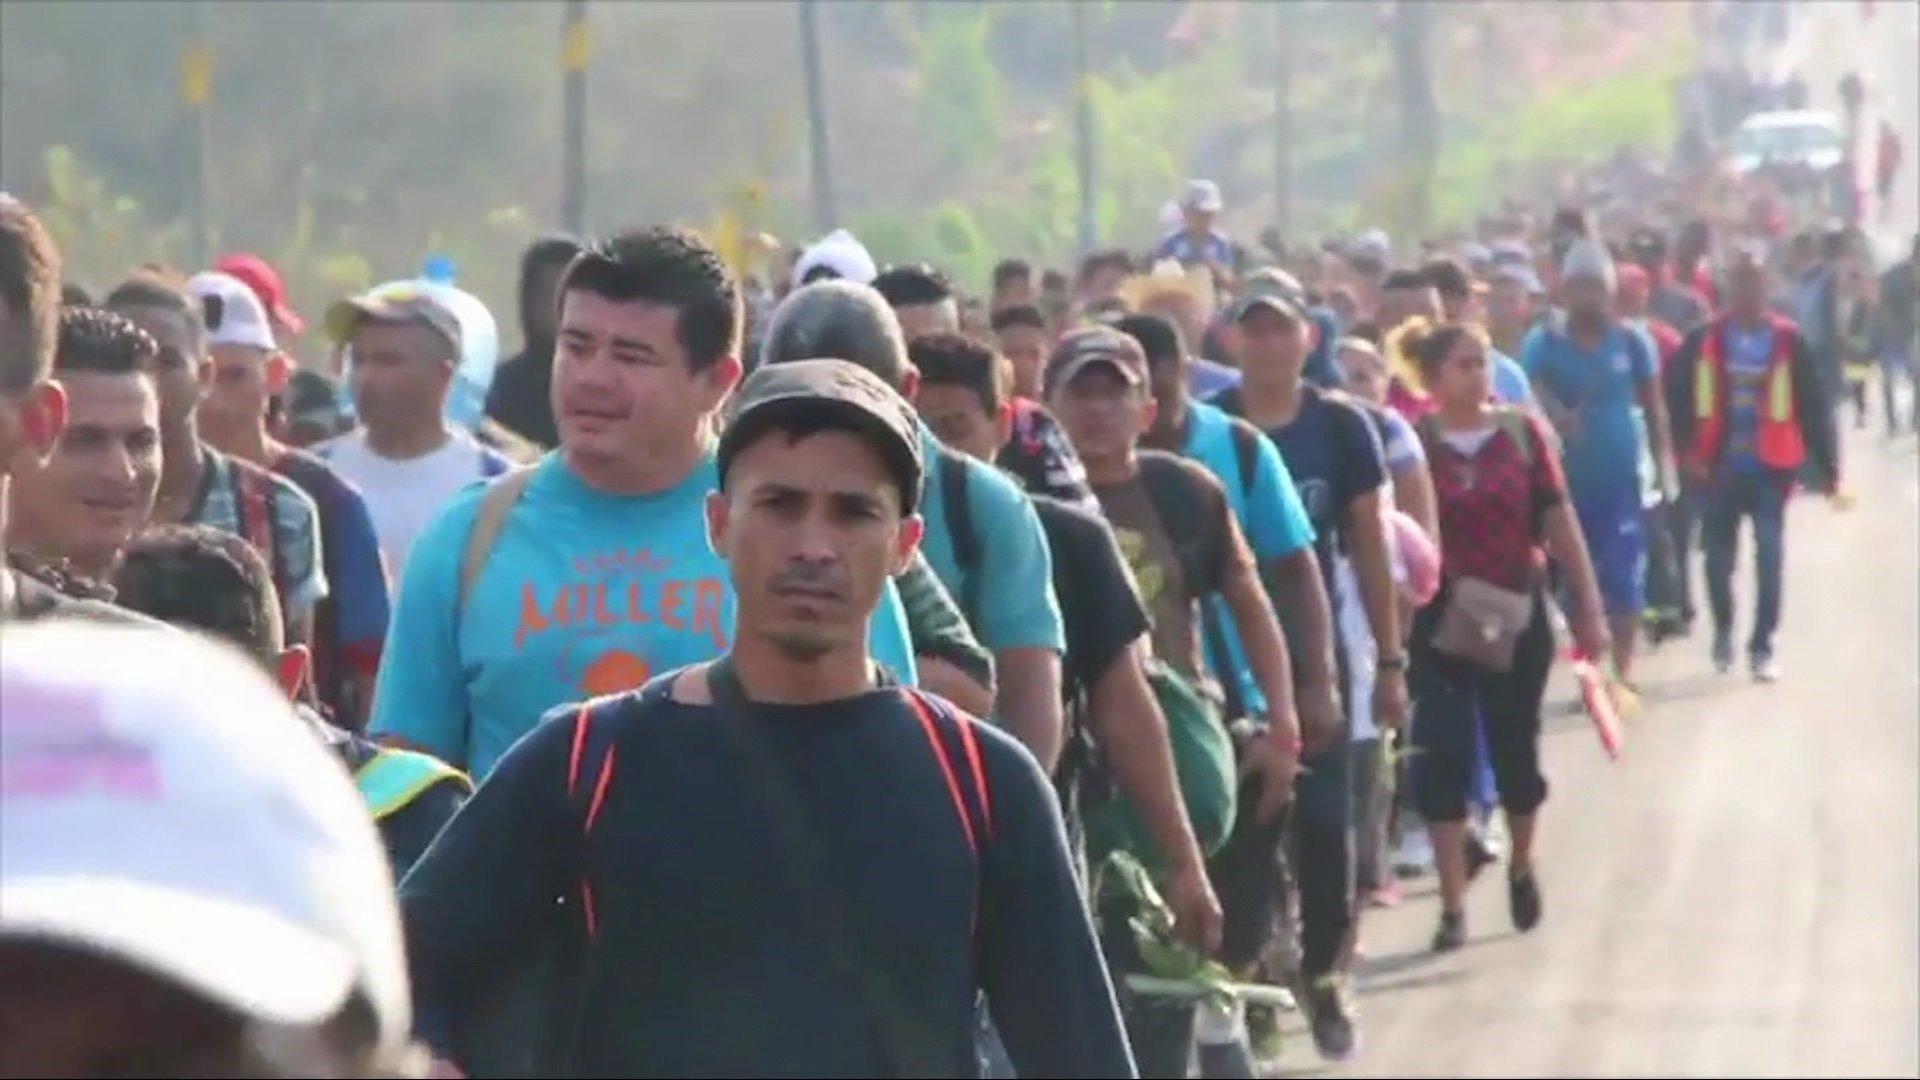 50 members of migrant caravan reach Mexico, US border